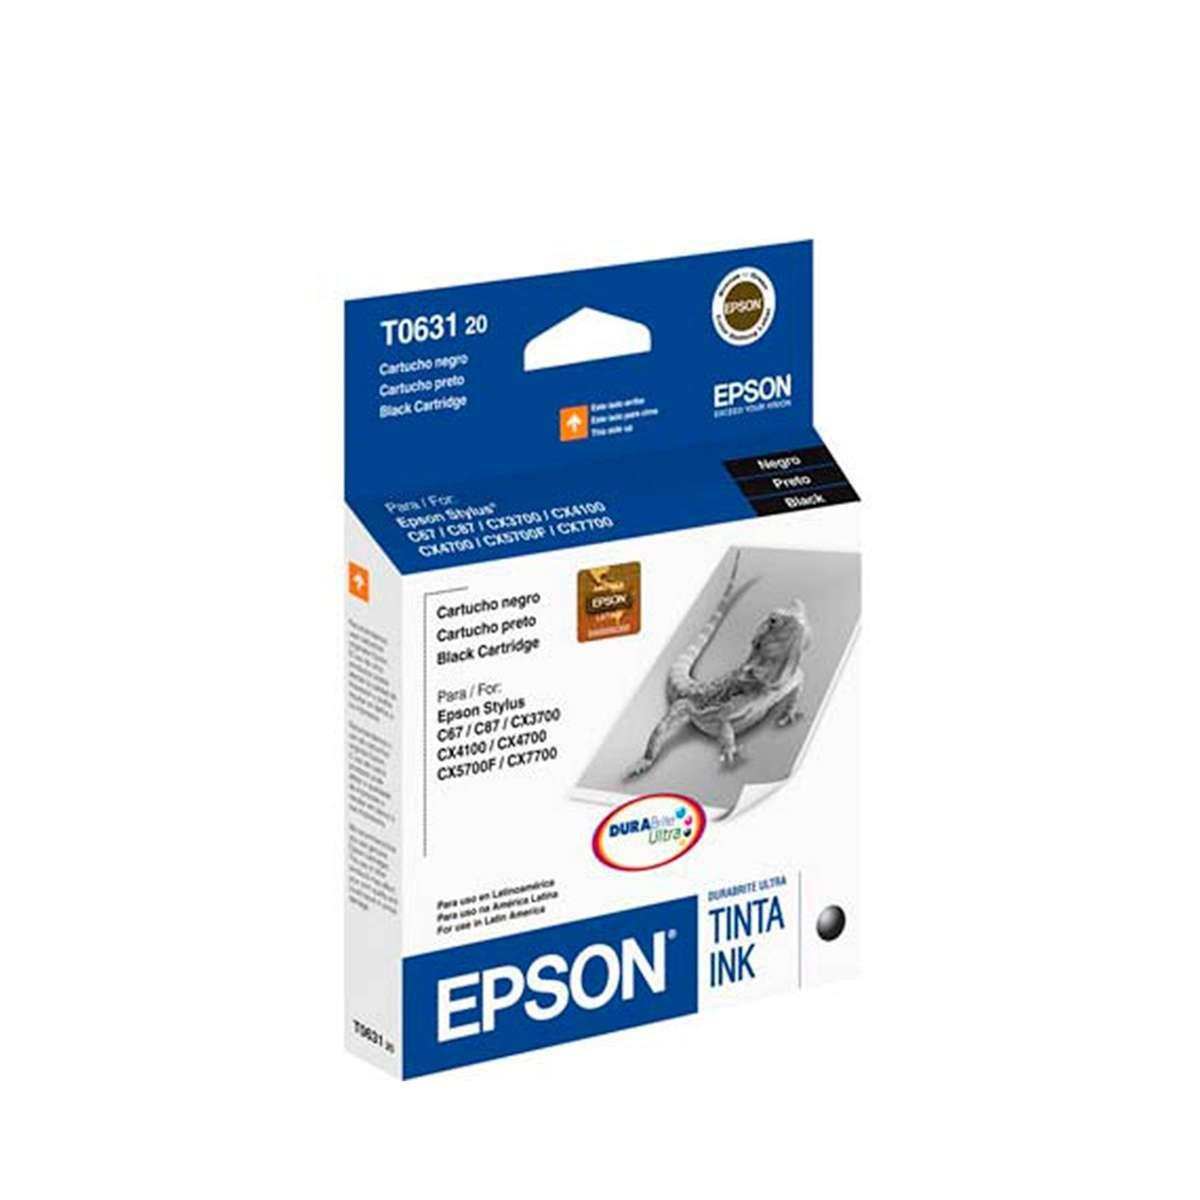 Cartucho de Tinta Epson T063120-BR Preto 8 ml